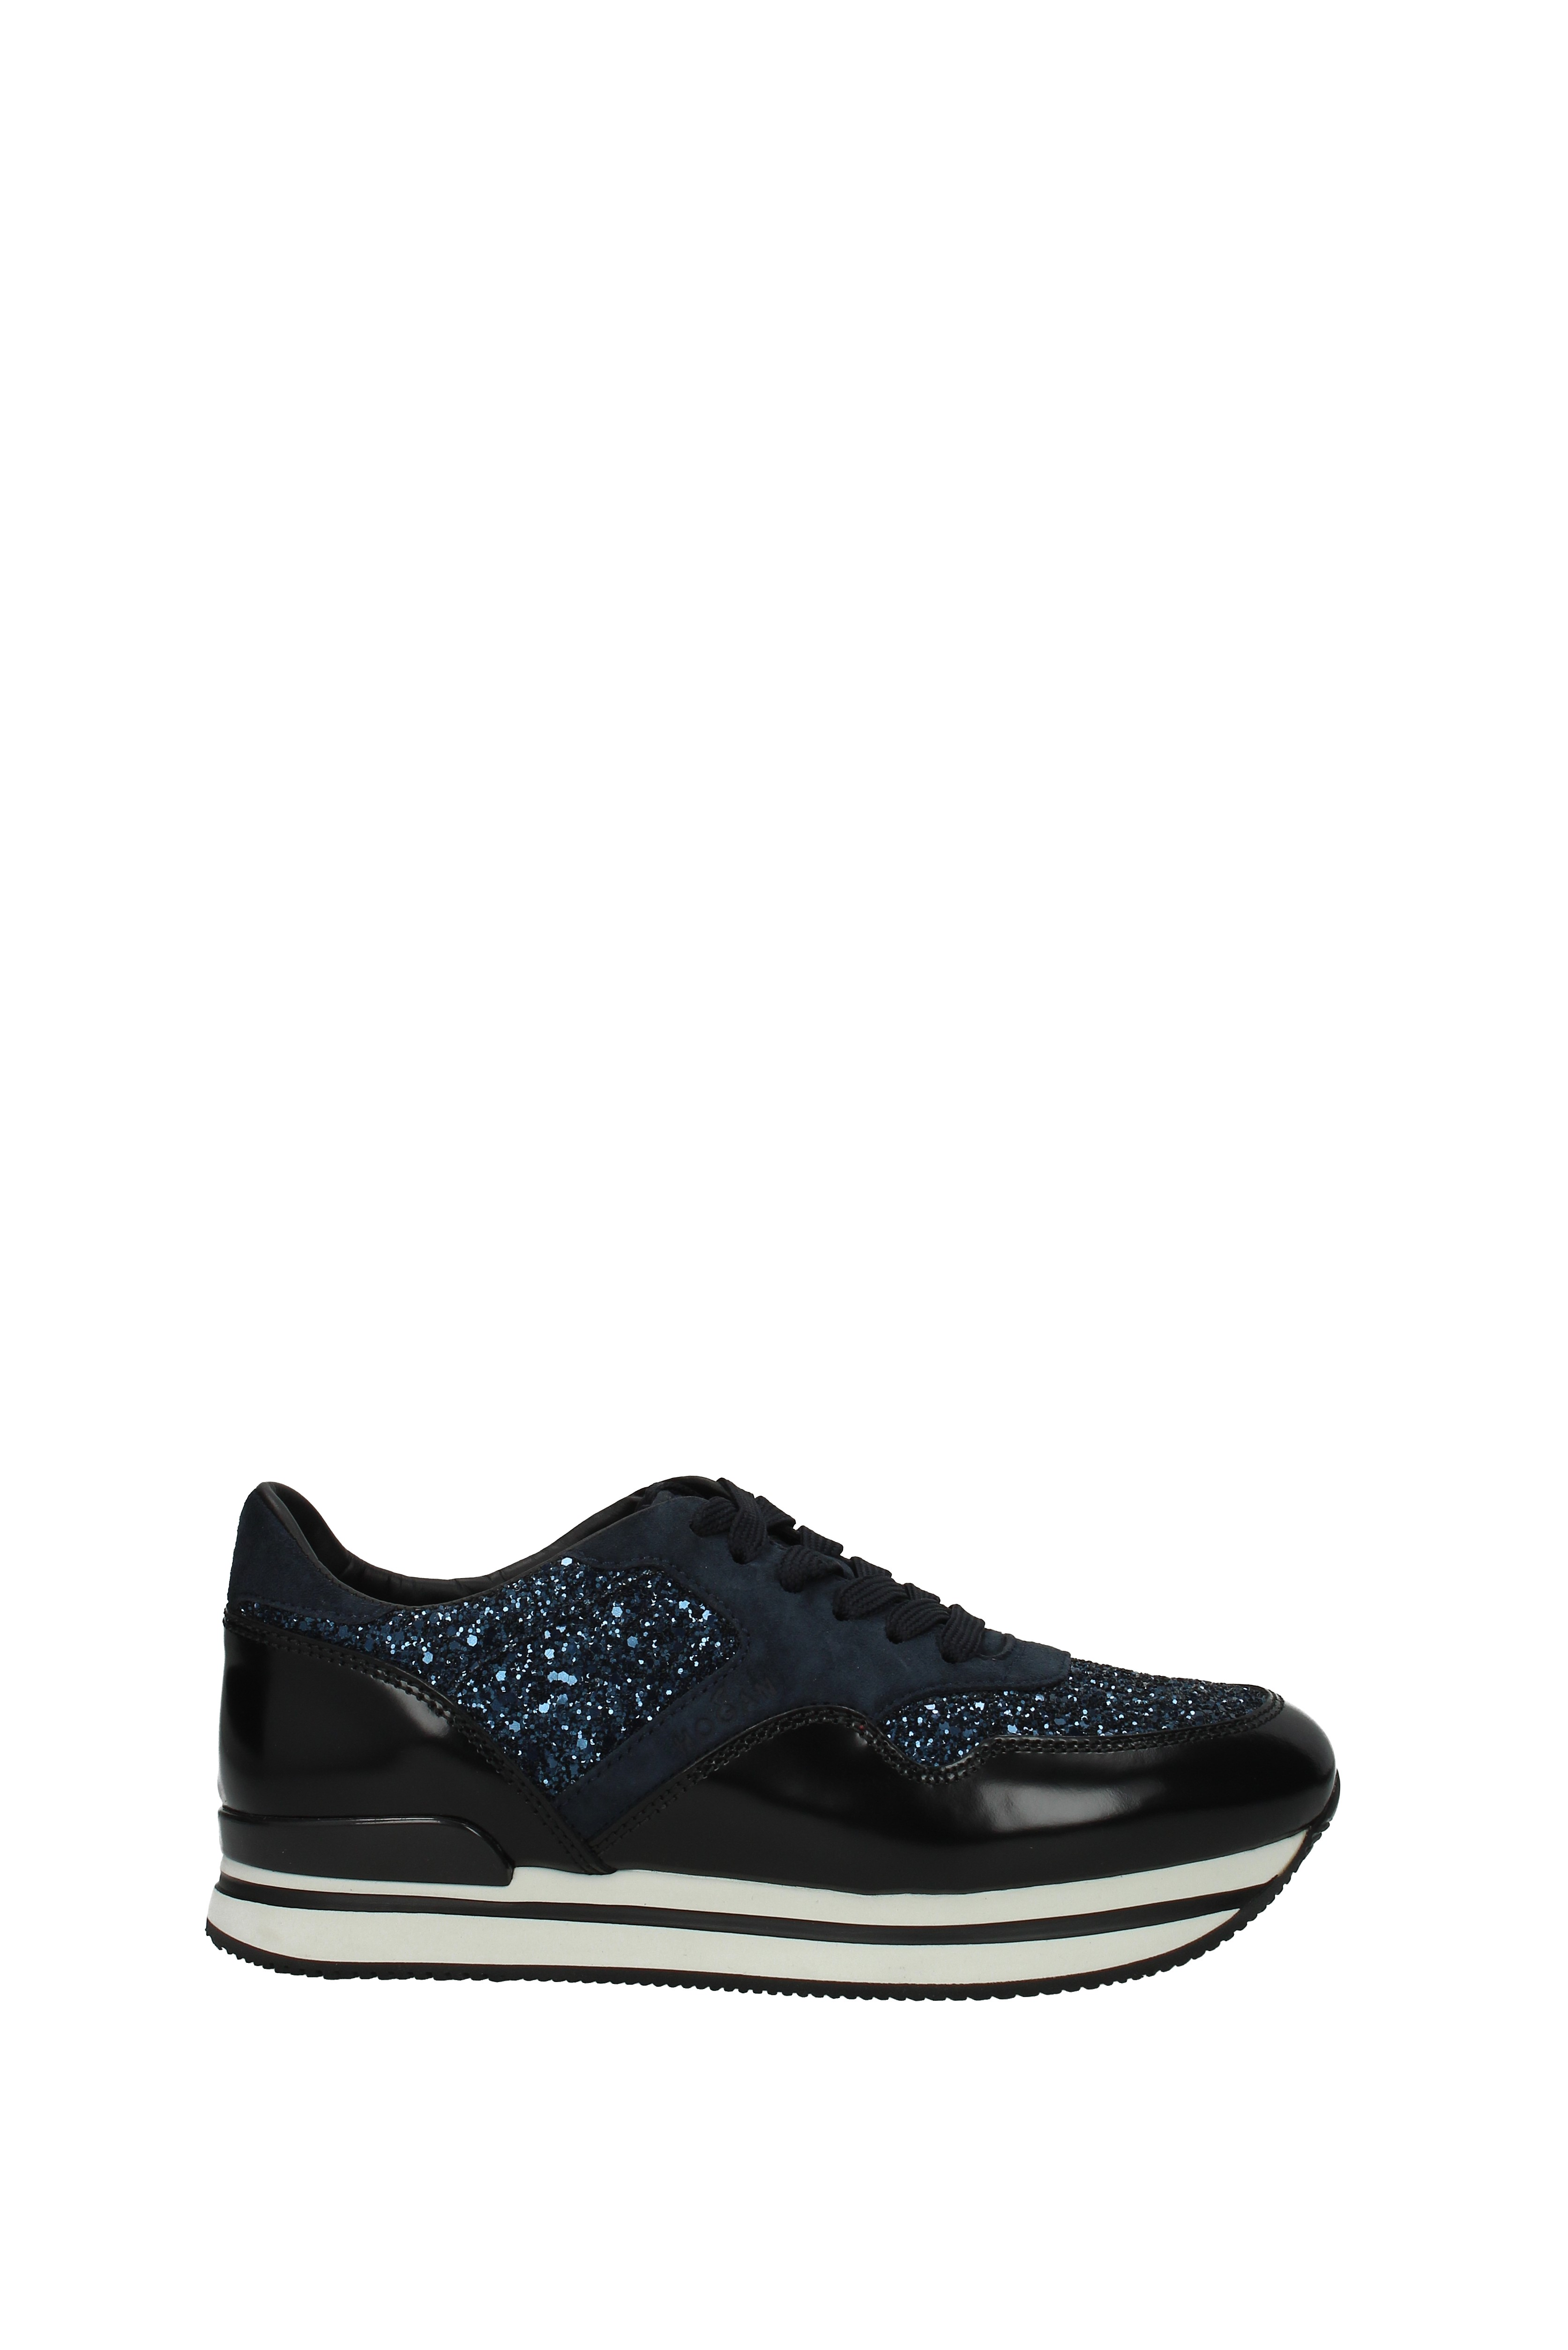 Alta qualit Sneakers Hogan Donna Pelle HXW2220N622HIB vendita